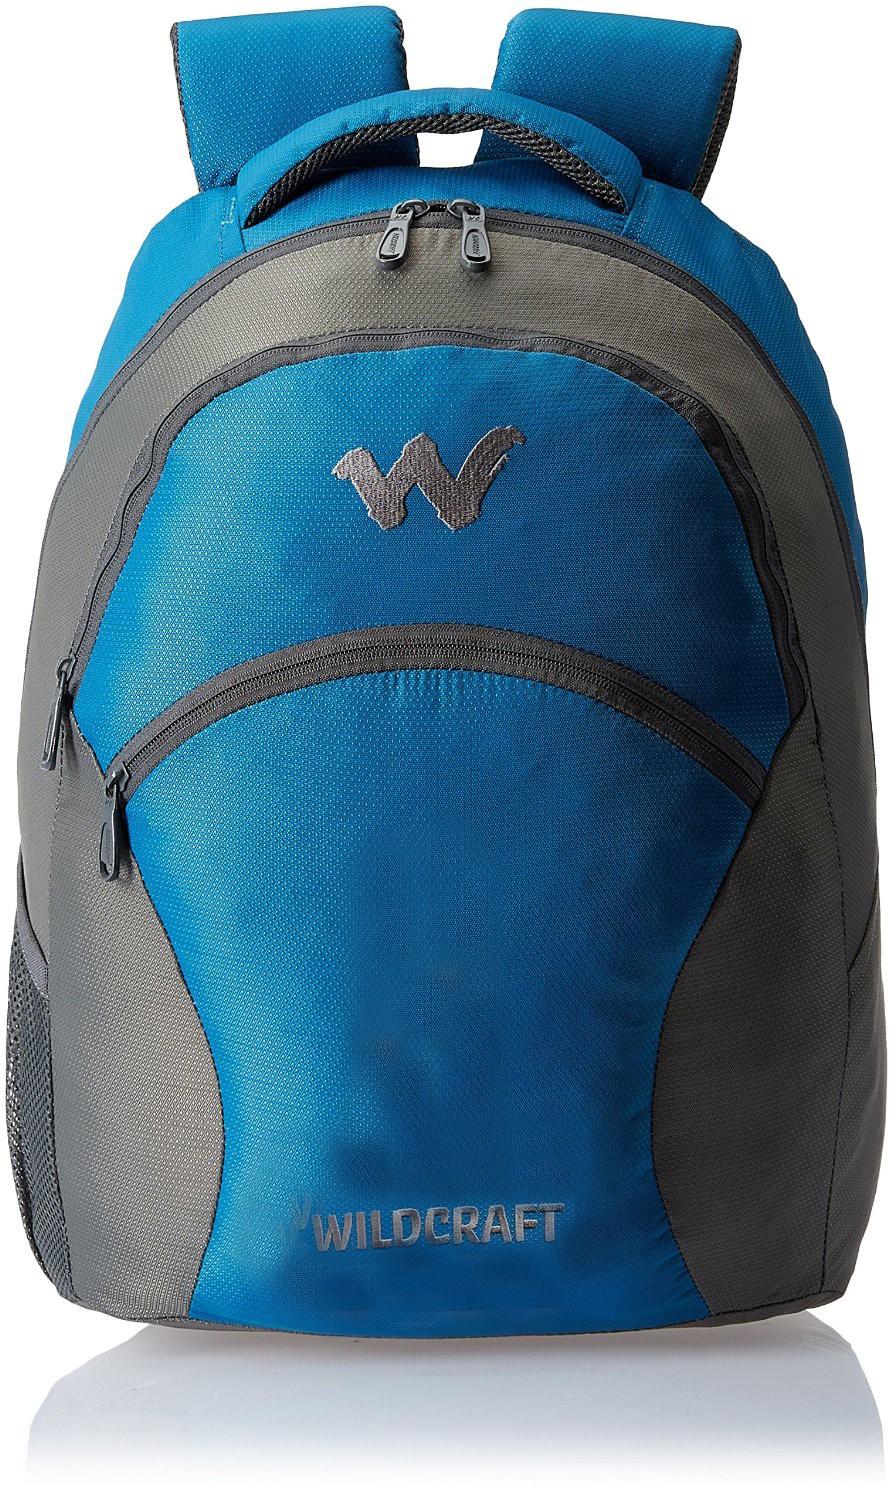 Wildcraft Blaze Print Camo Laptop Backpack- Fenix Toulouse Handball a34b15d60e34f